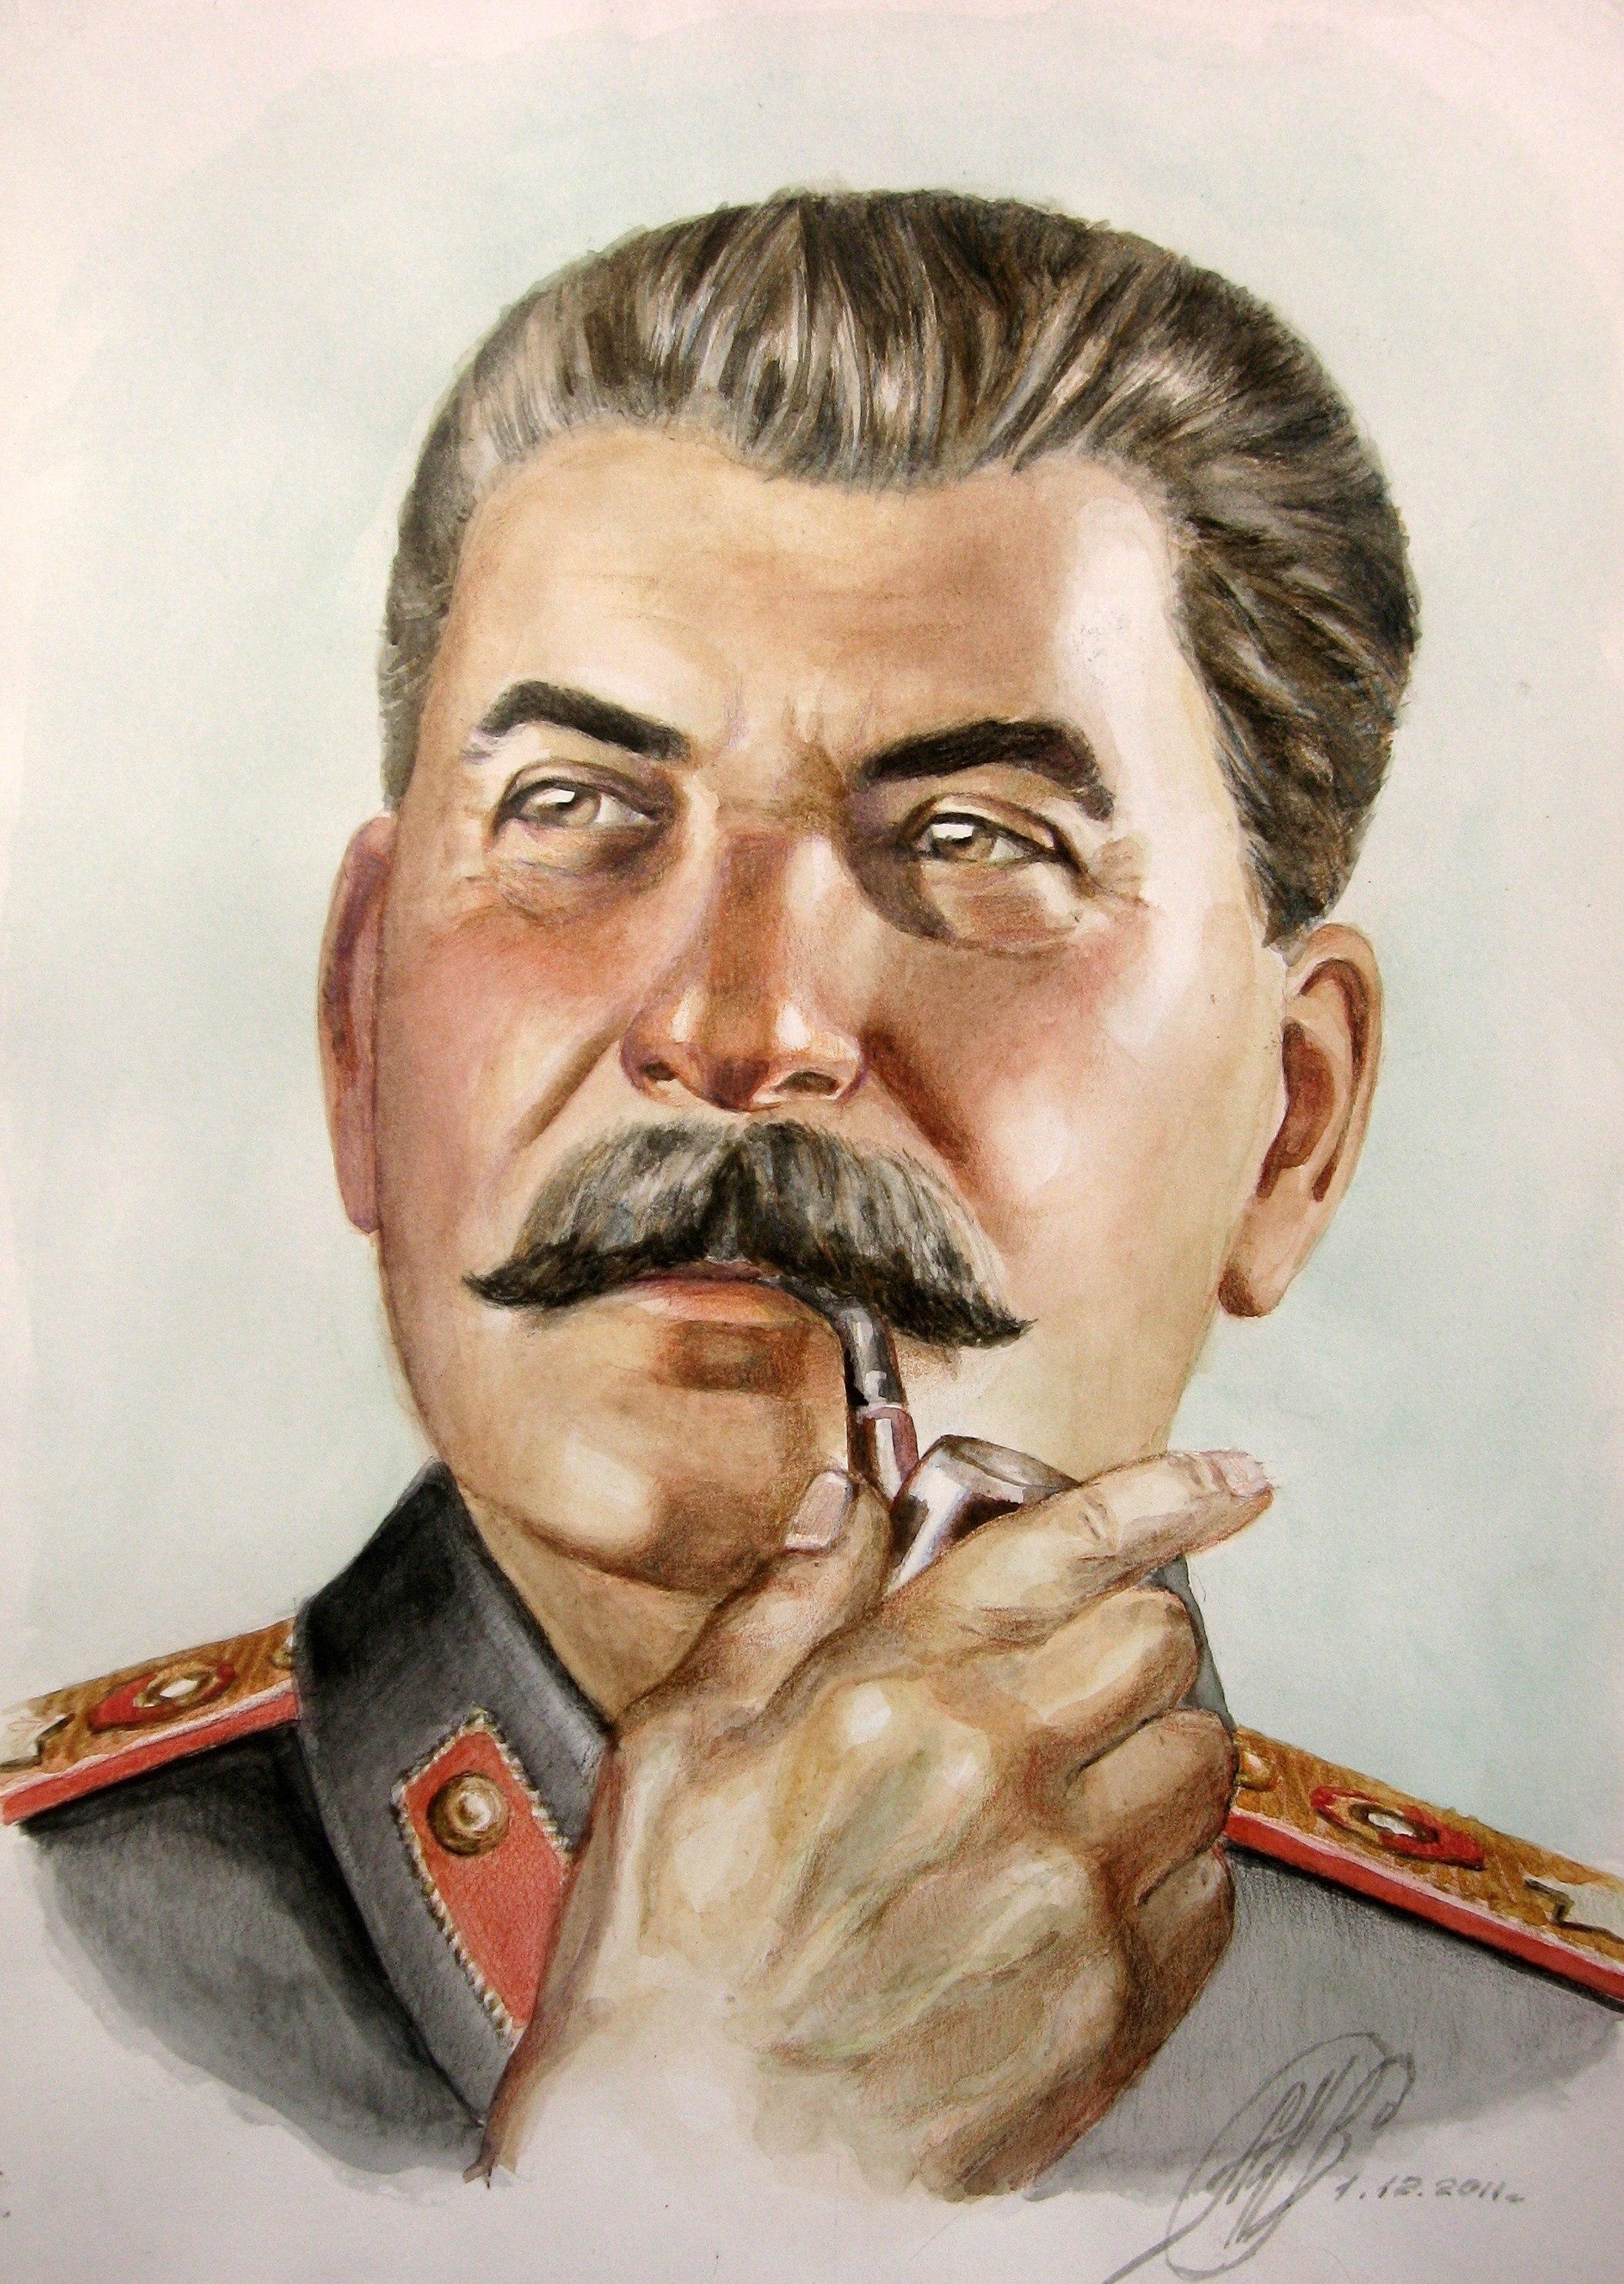 http://www.zhivopismira.ru/upload/706/12513117026537.jpg